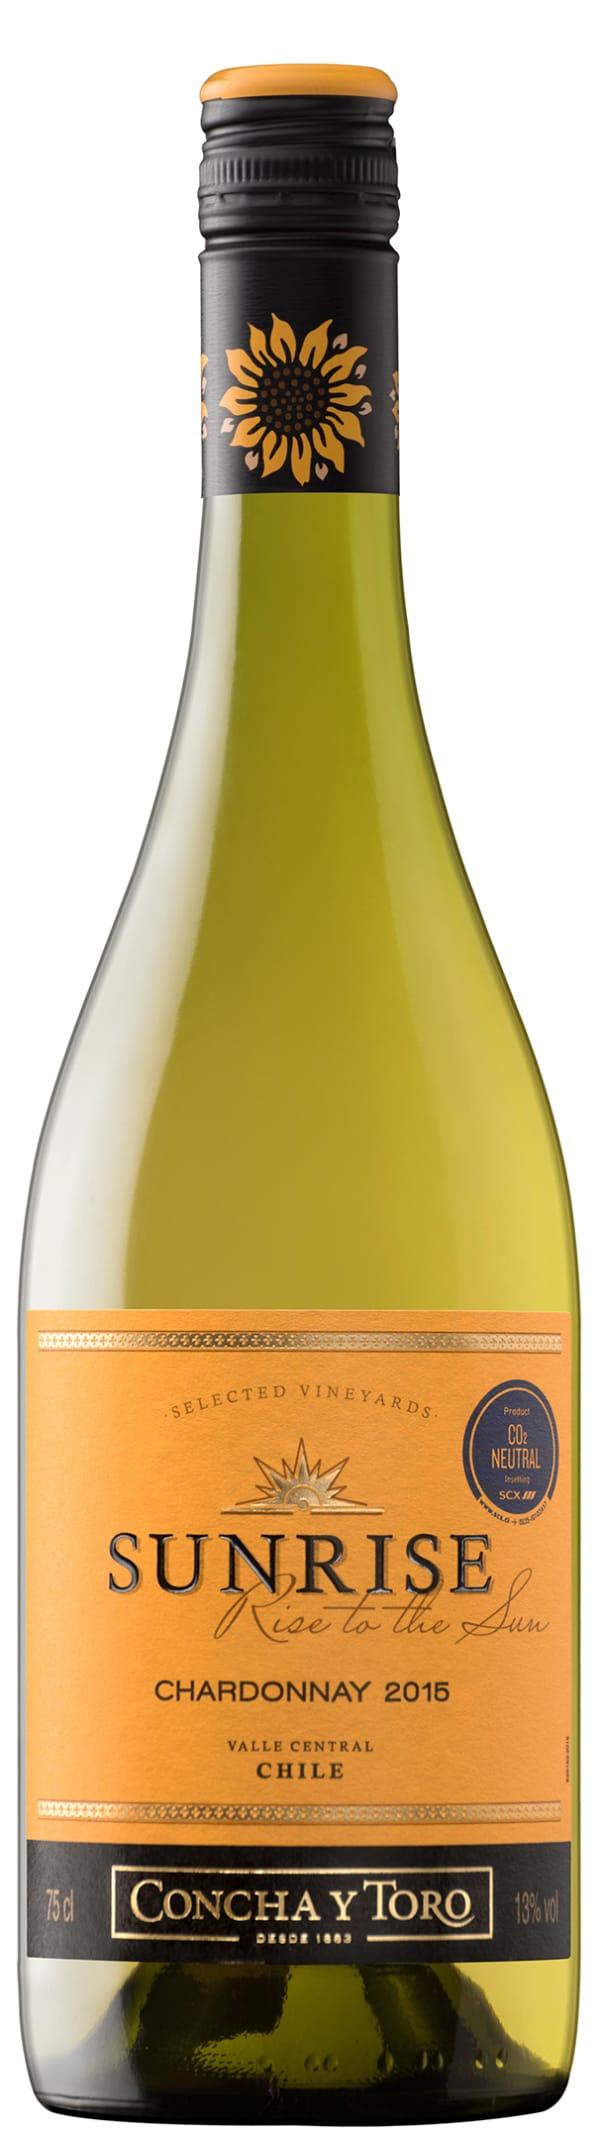 Sunrise Chardonnay 2016